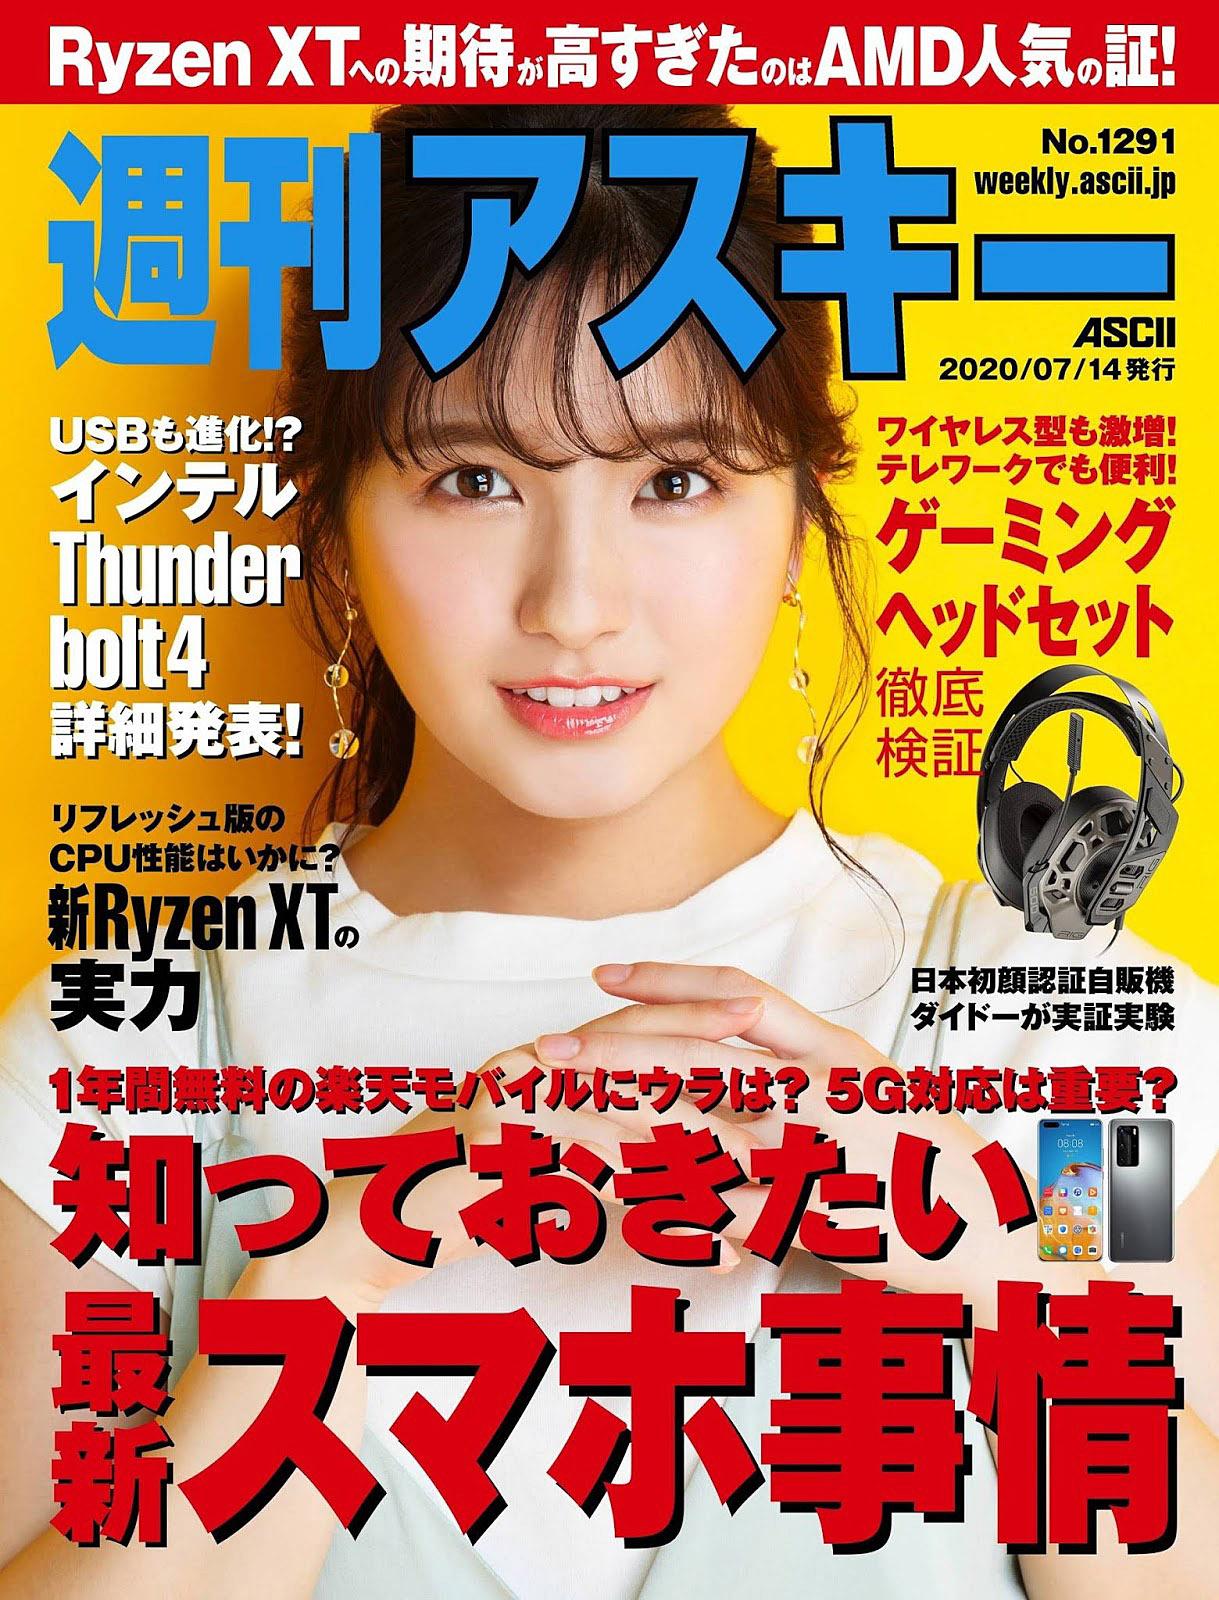 NOwada Weekly Ascii 200714 01.jpg